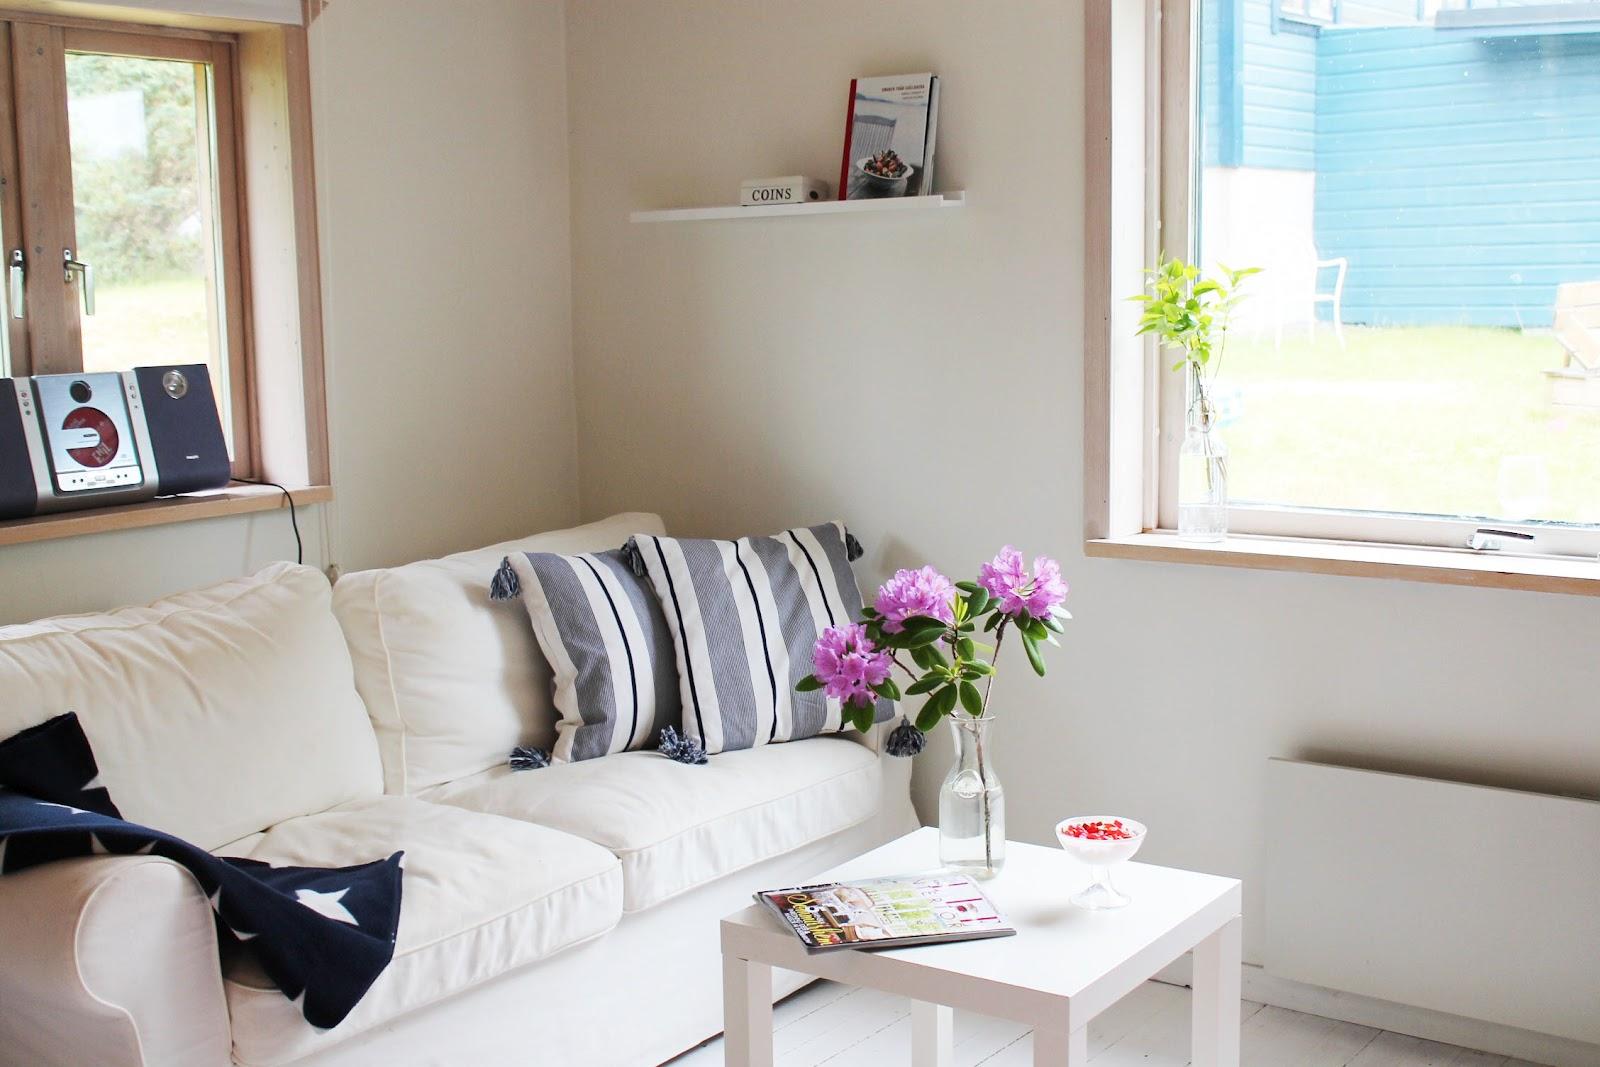 Lifestyle by lena: 25 kvadrat i stockholms skÄrgÅrd